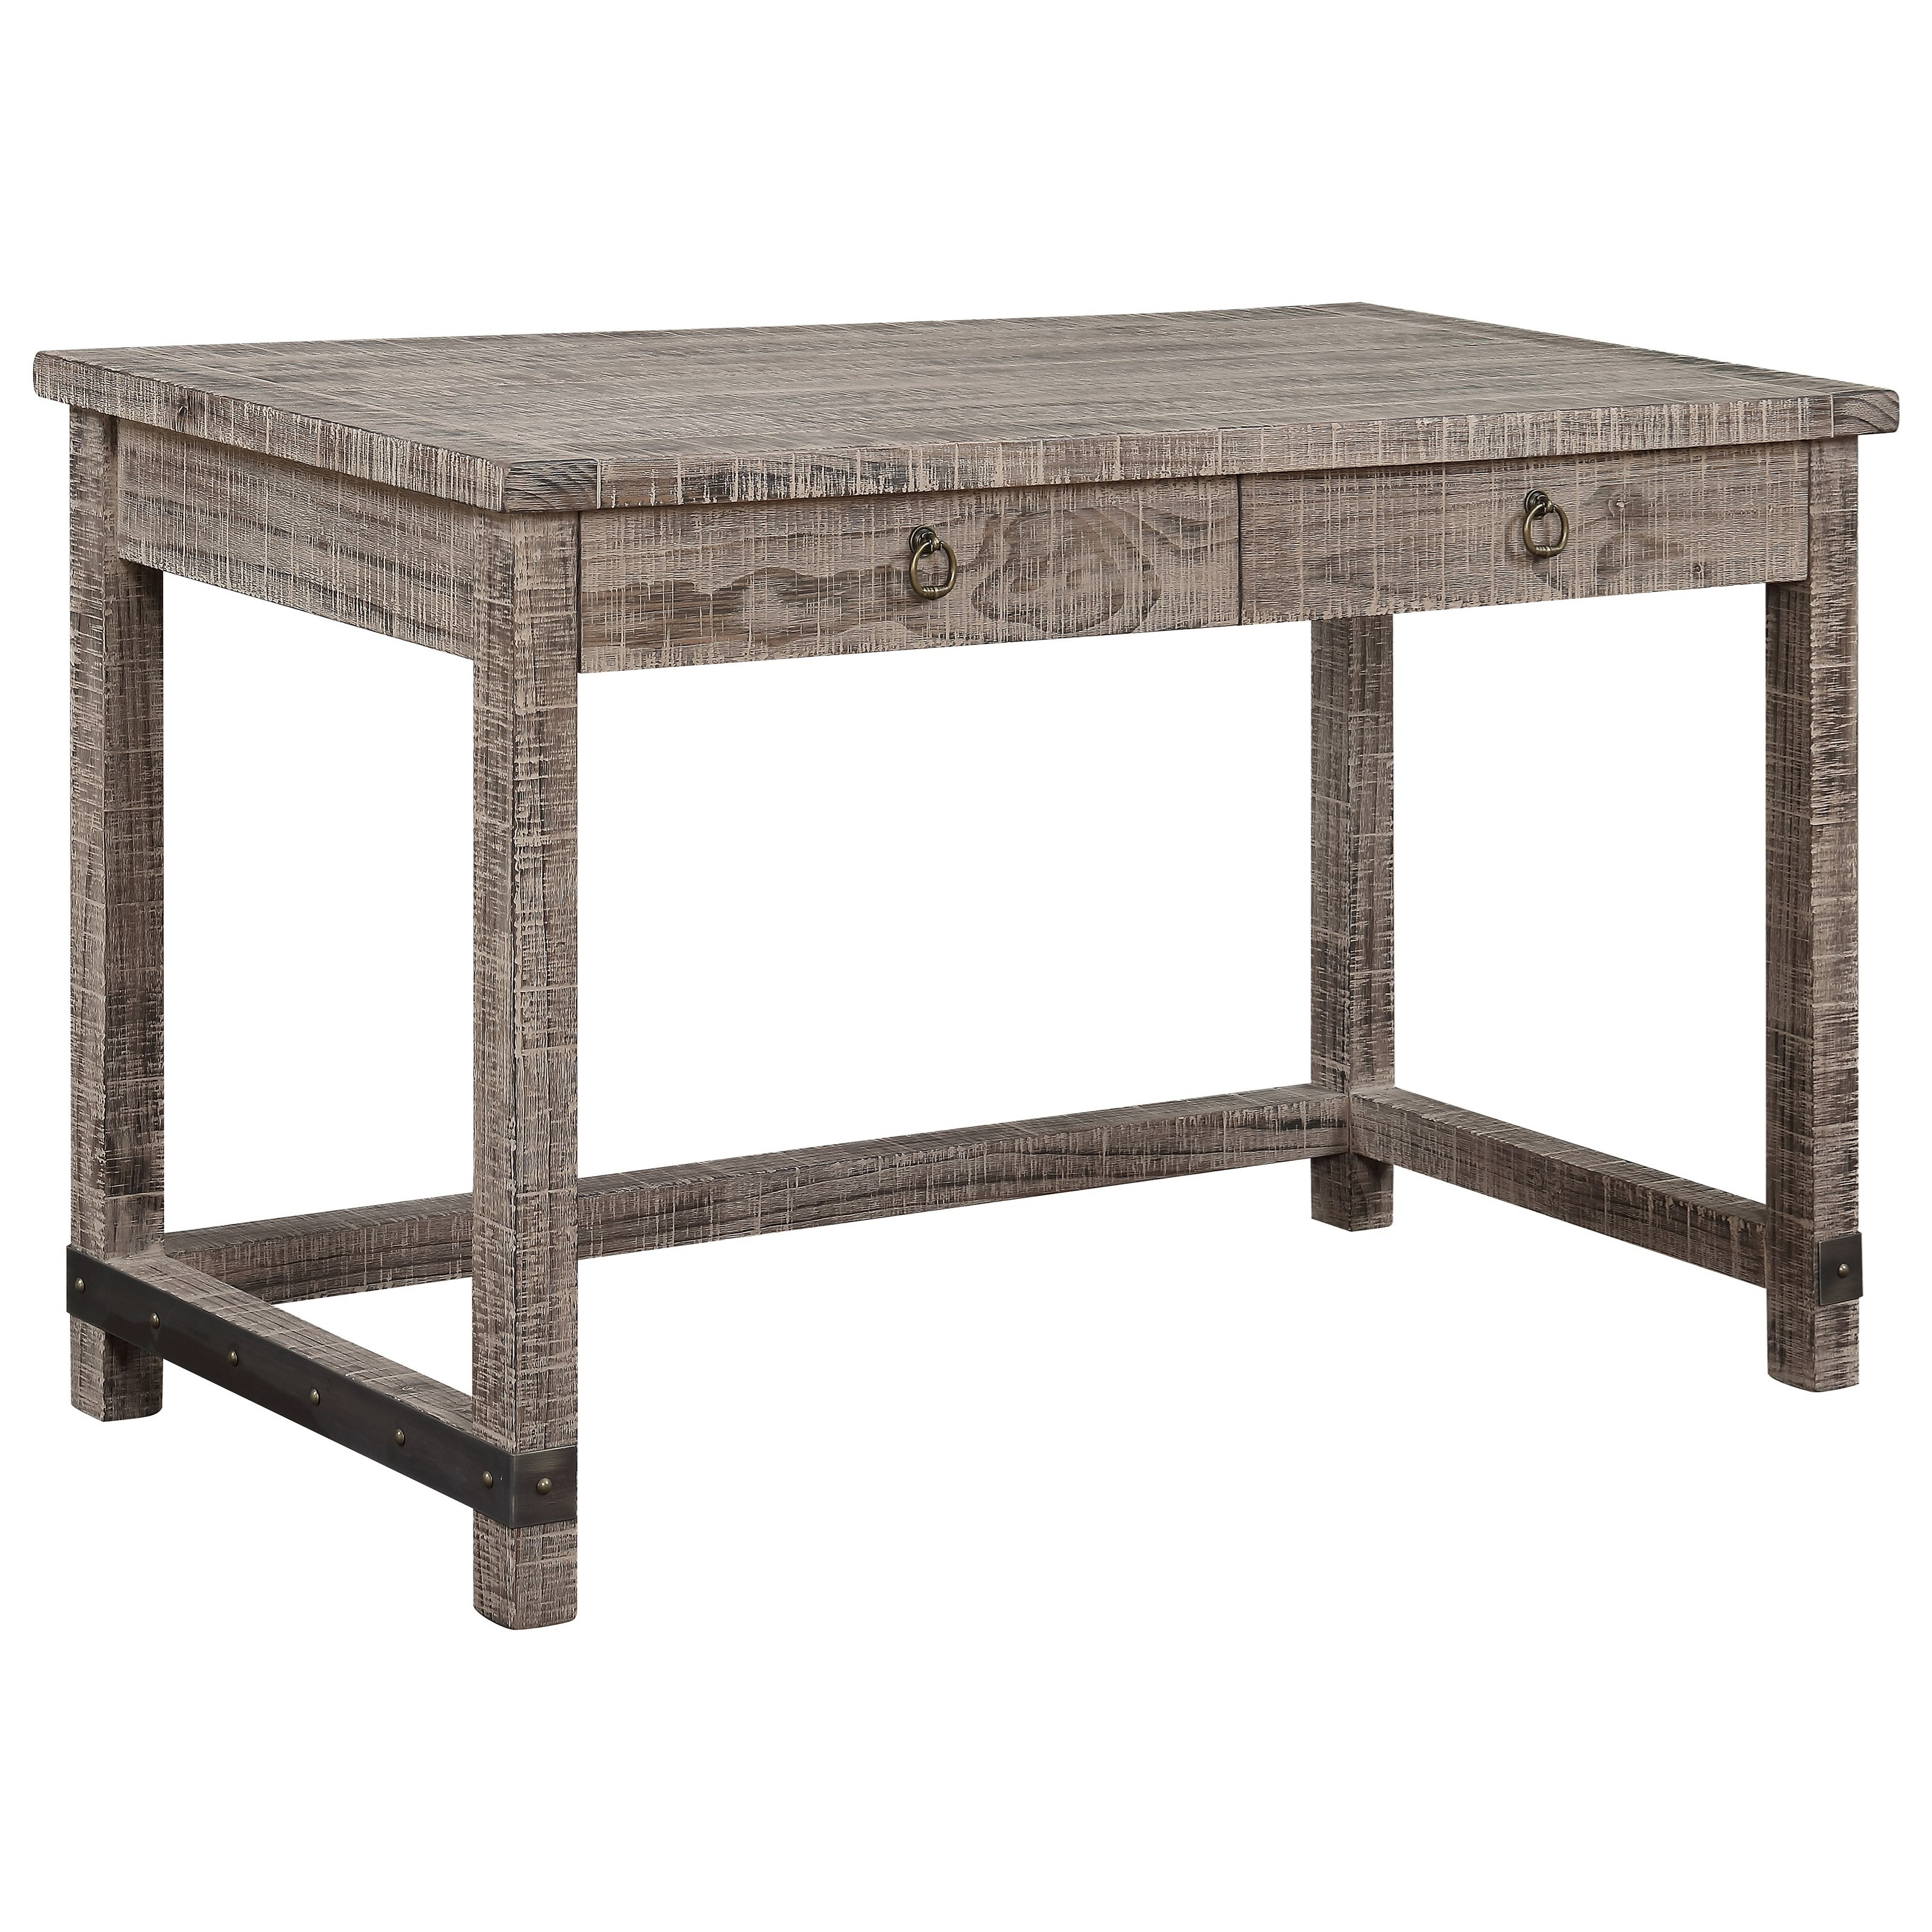 Dakota Desk by Emerald at Northeast Factory Direct